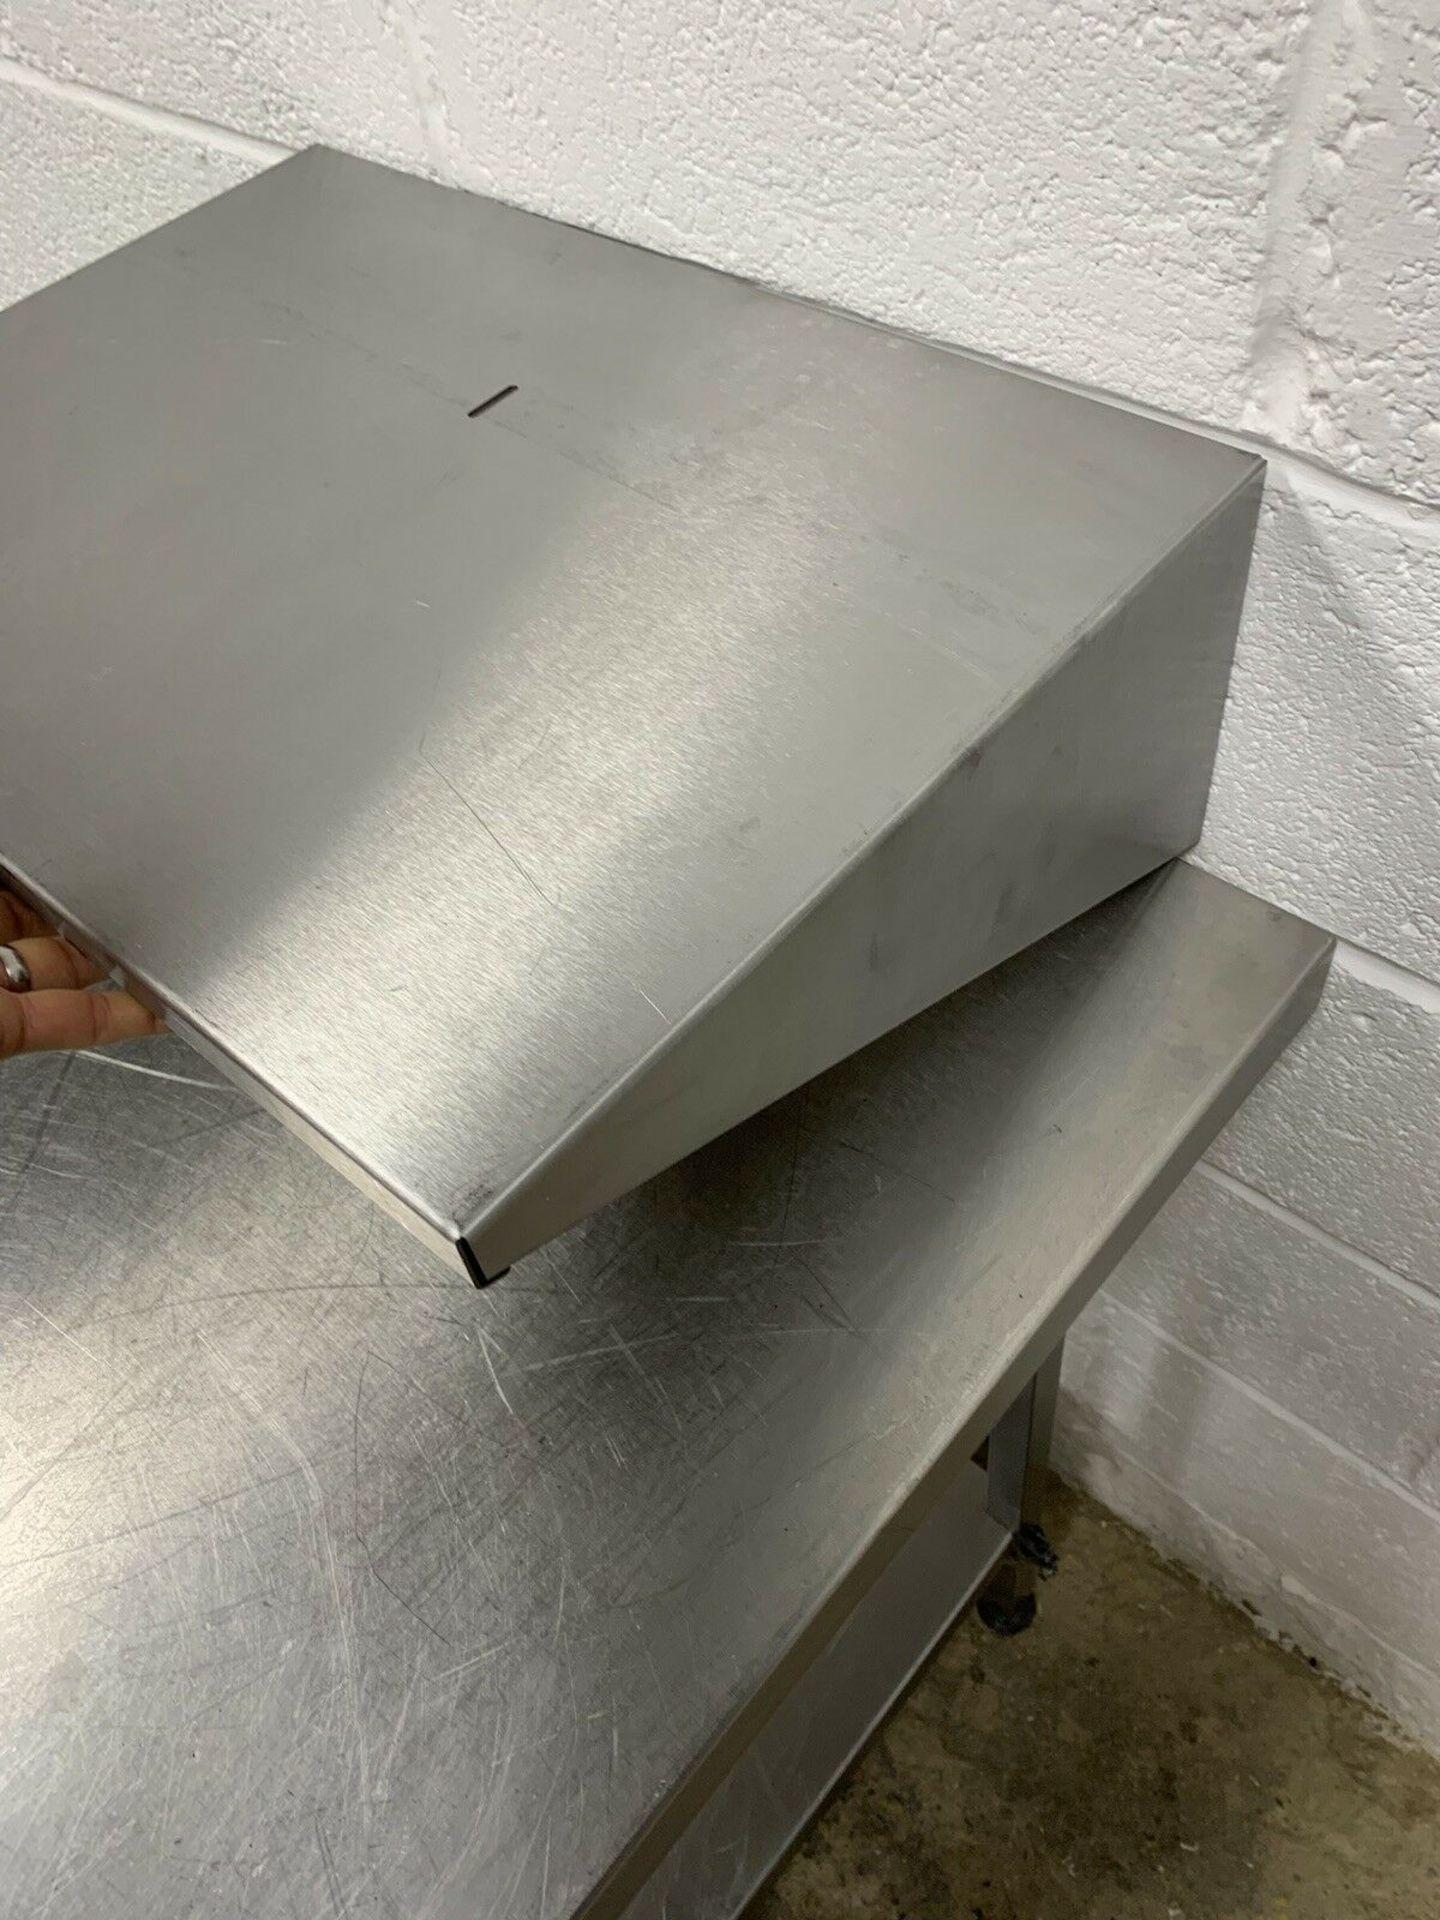 Lot 95 - Stainless Steel Shelf